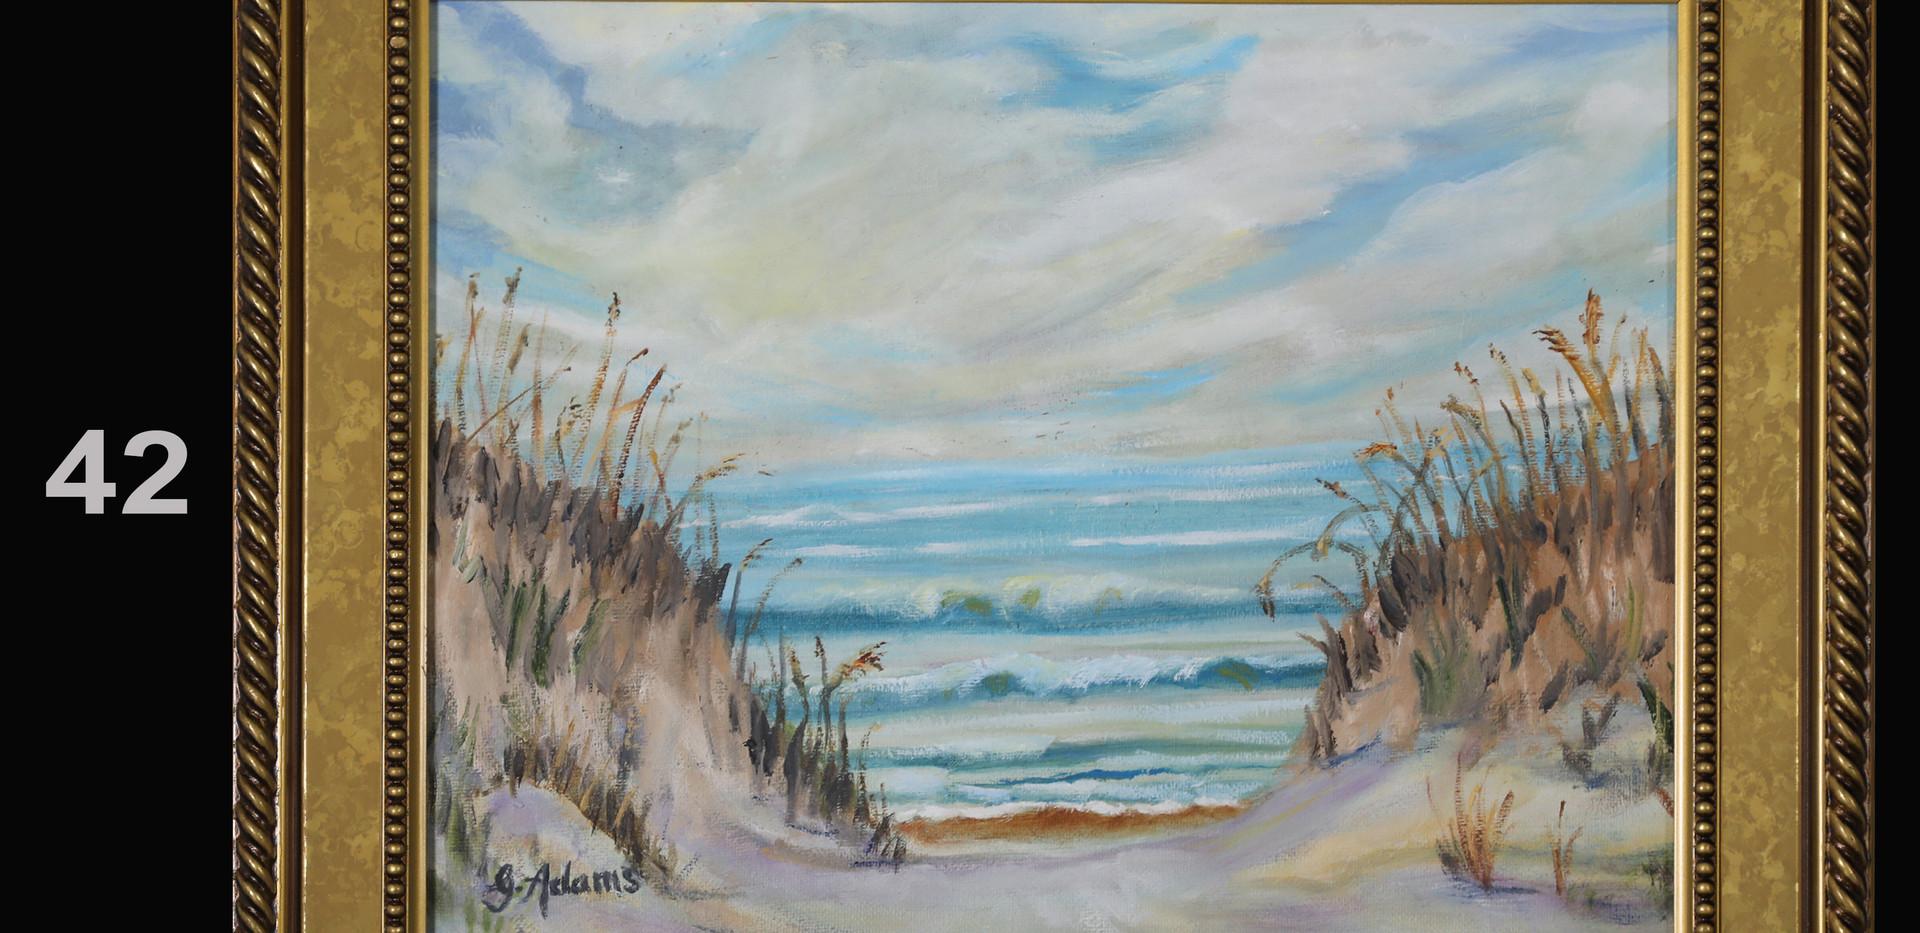 42. Sea Oats and Dunes